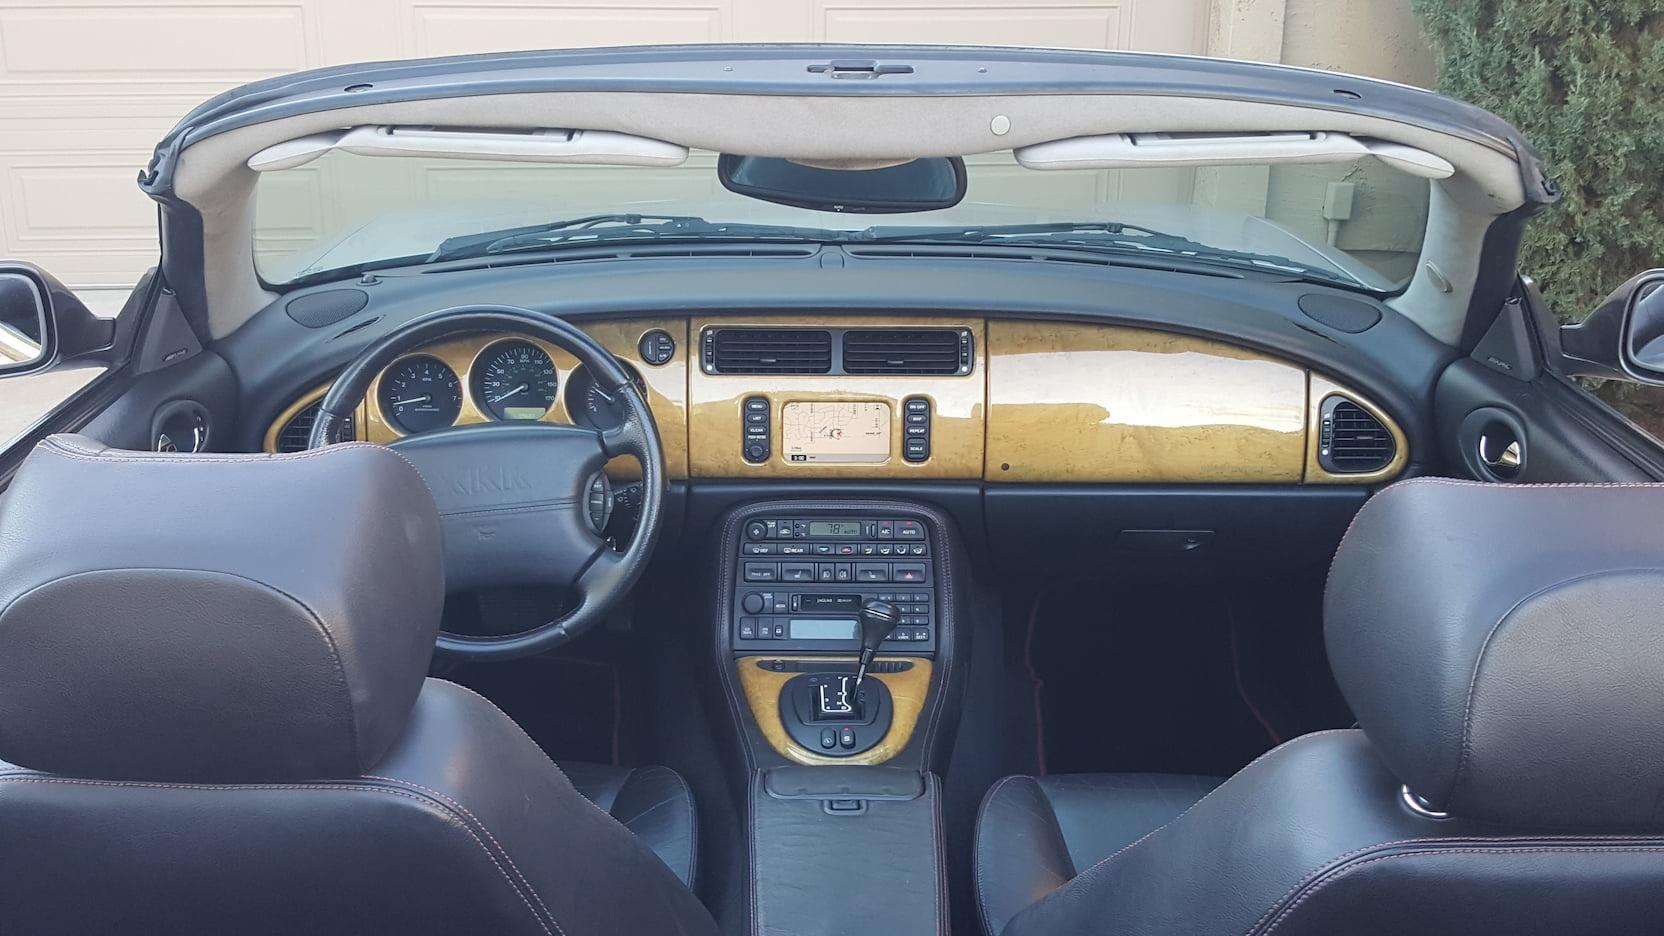 2001 Jaguar XKR interior